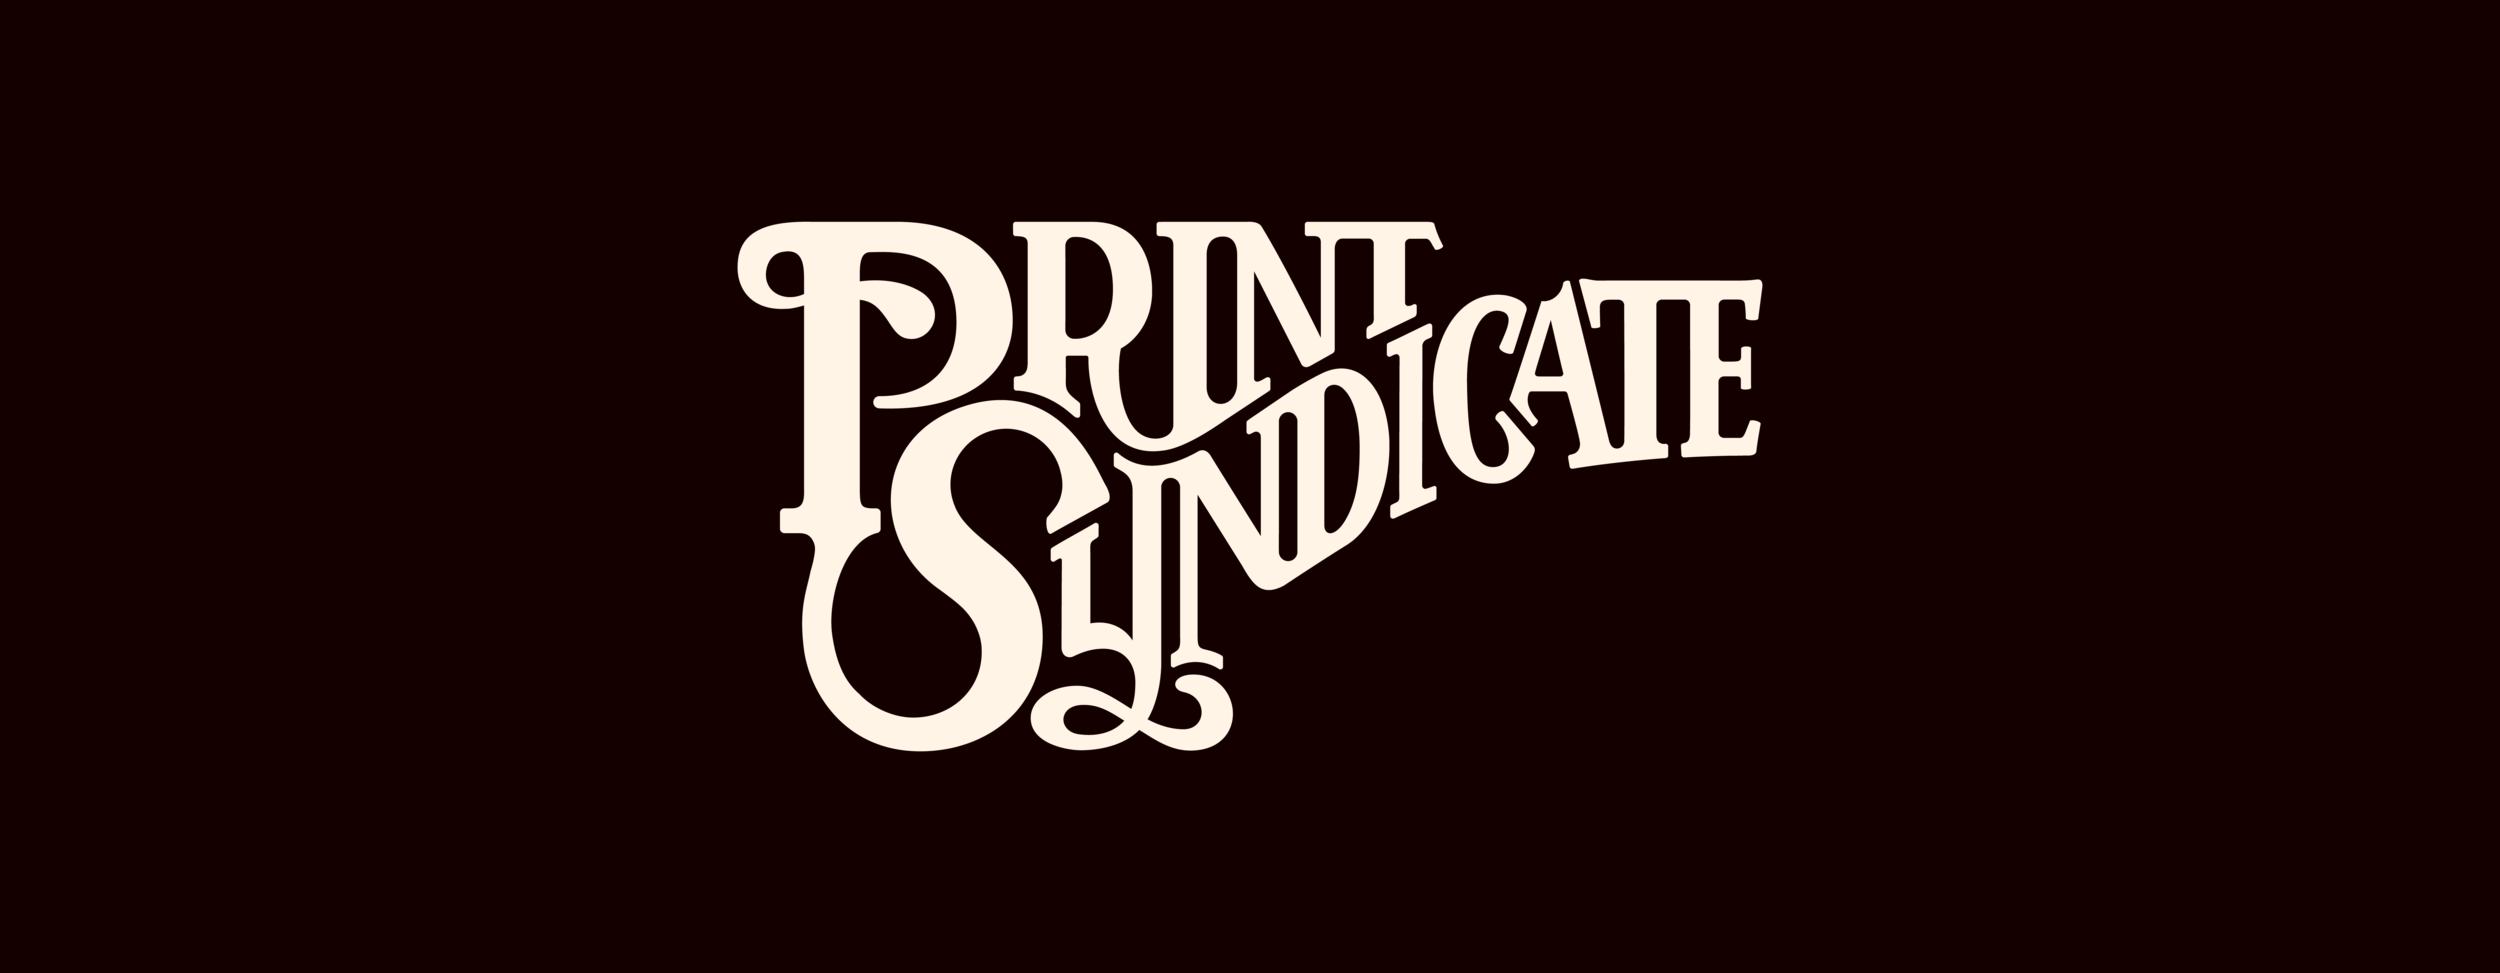 Print Syndicate (2012)